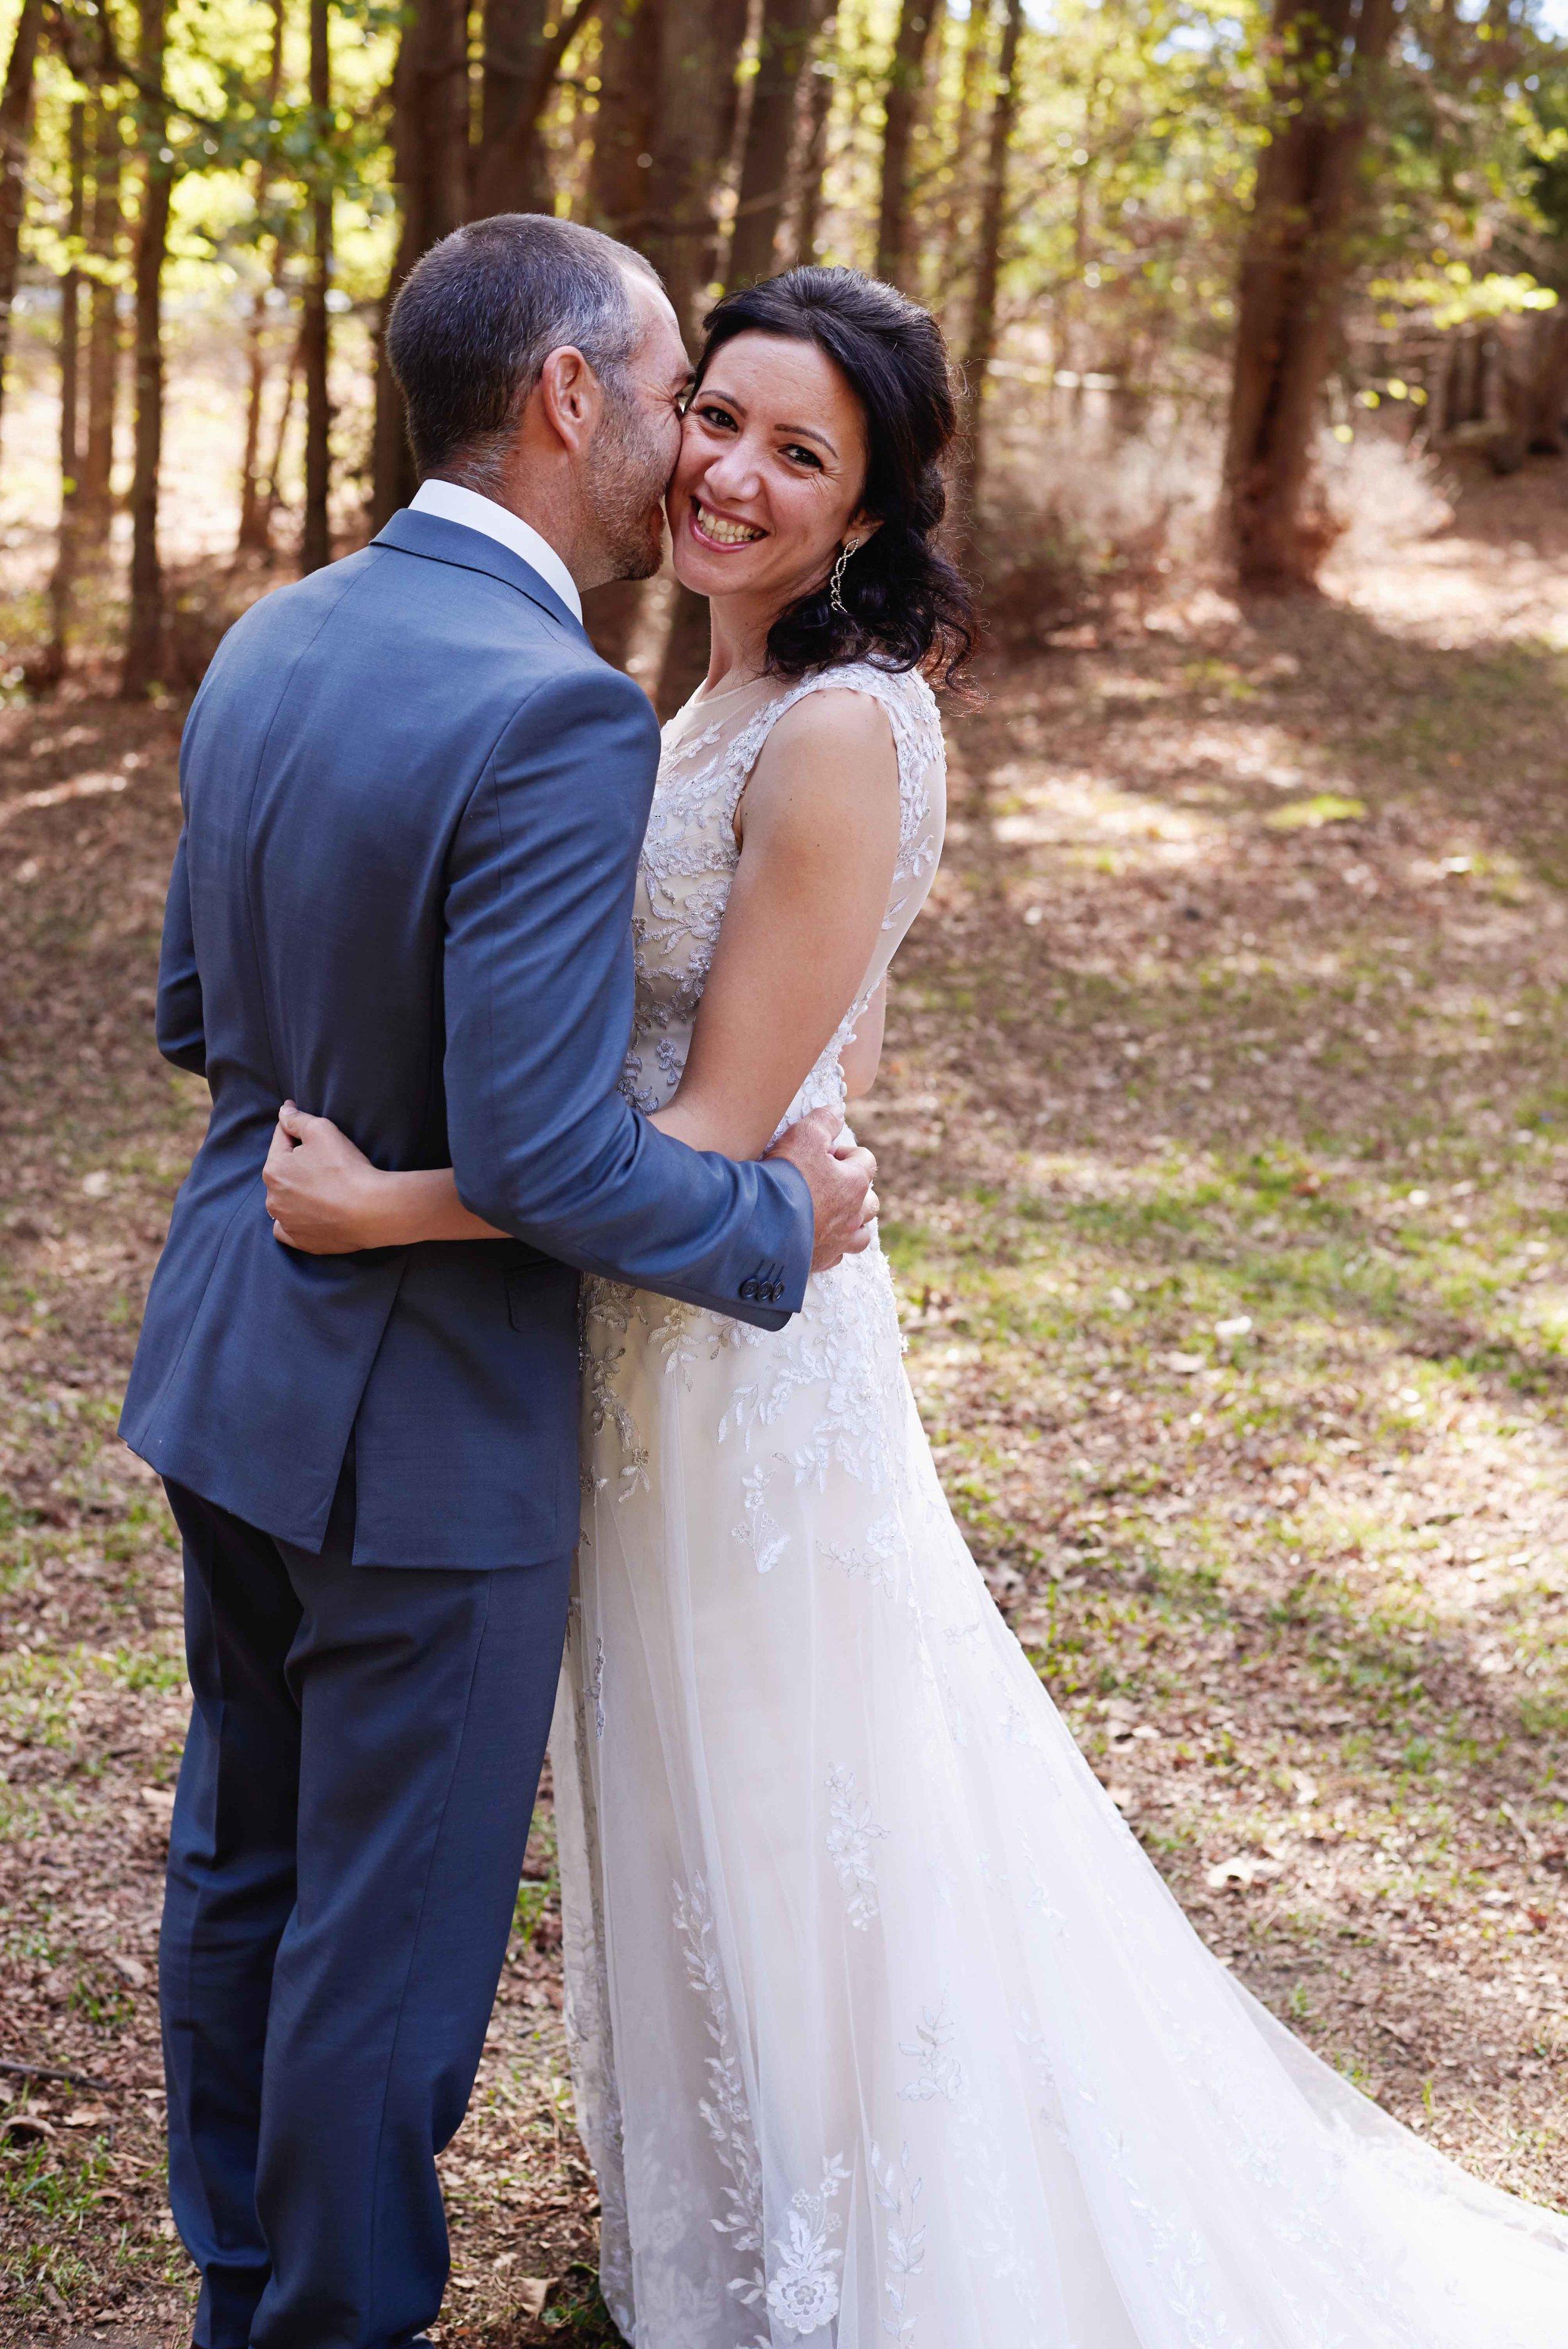 sorrento-wedding-photography-all-smiles-marissa-jade-photography-138.jpg